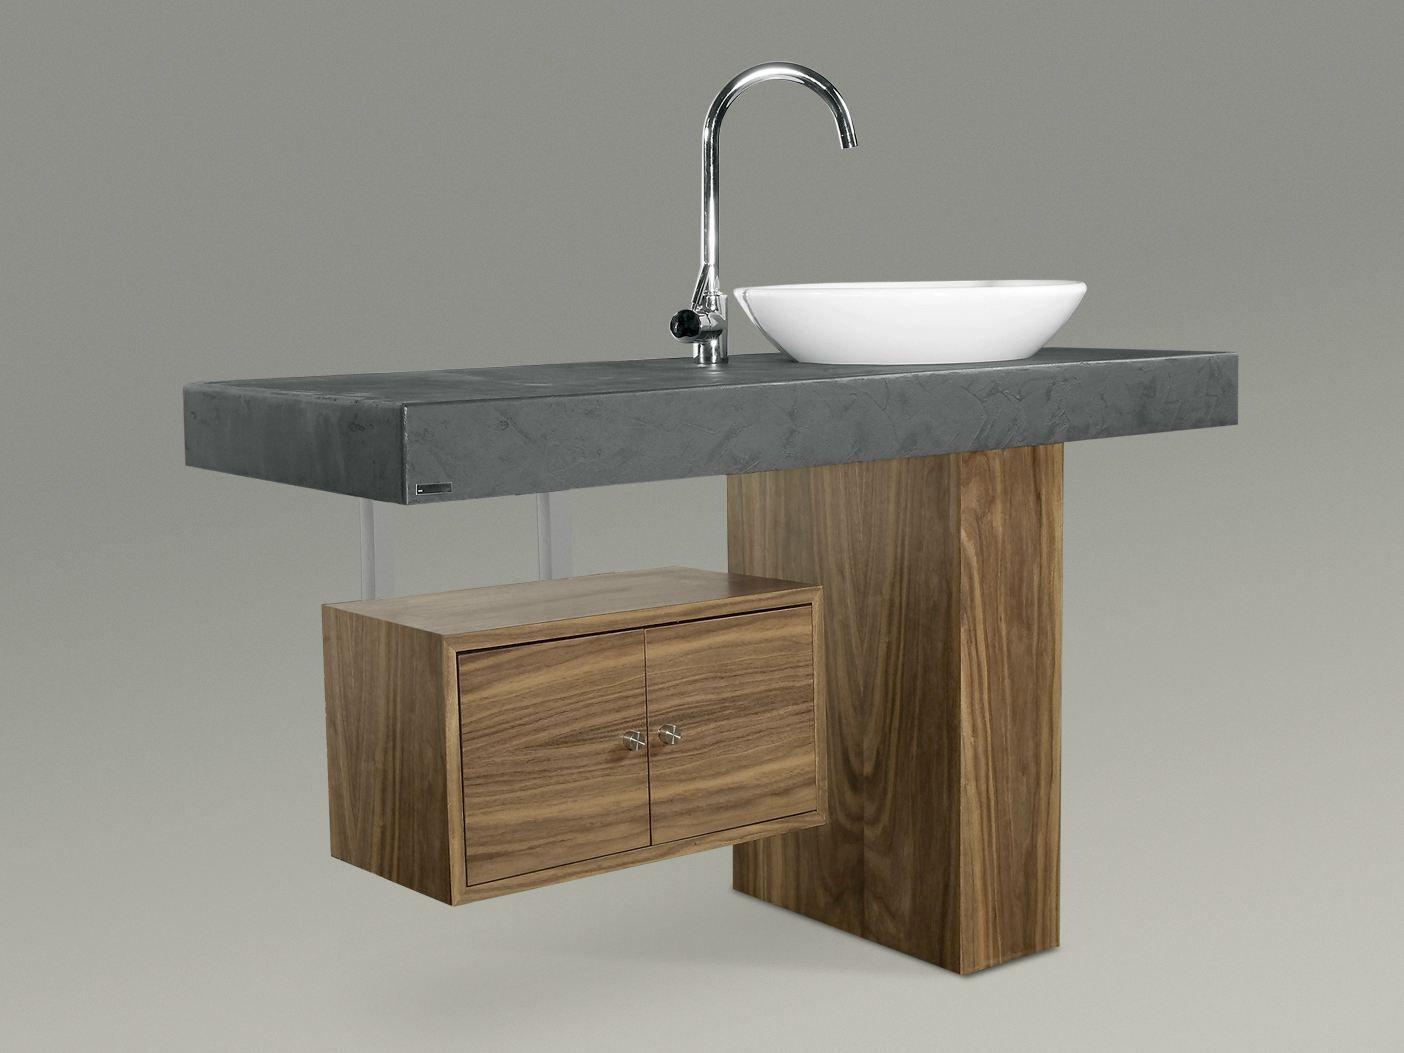 701 meuble sous vasque by wissmann raumobjekte for Meuble sous vasque